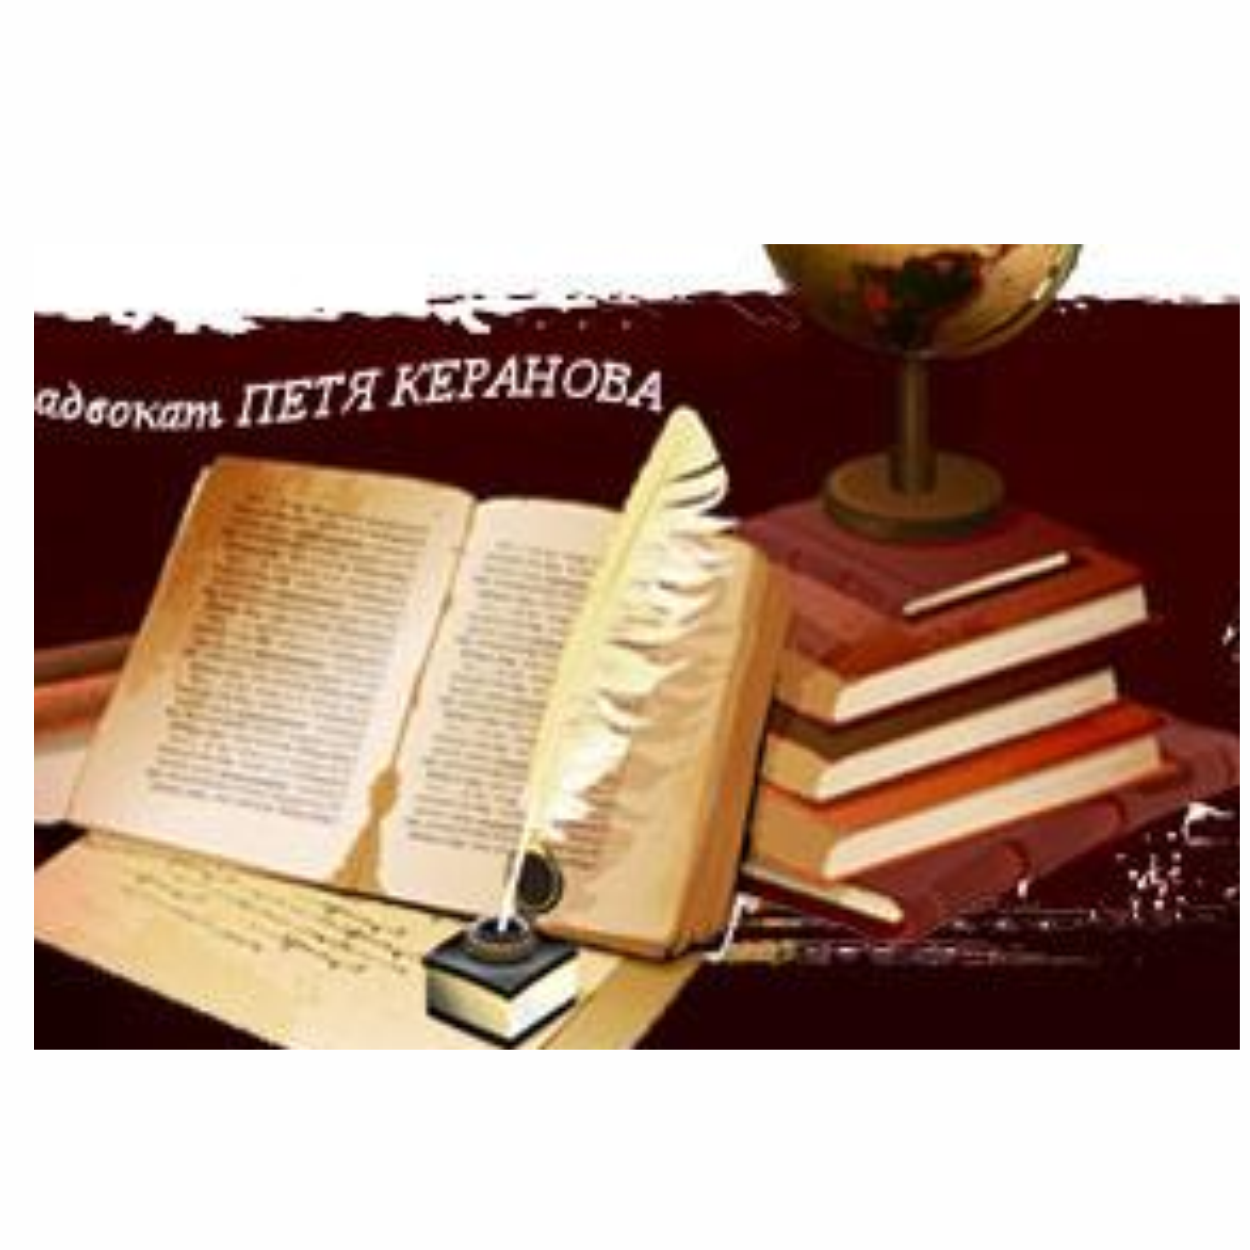 Адвокат Петя Керанова